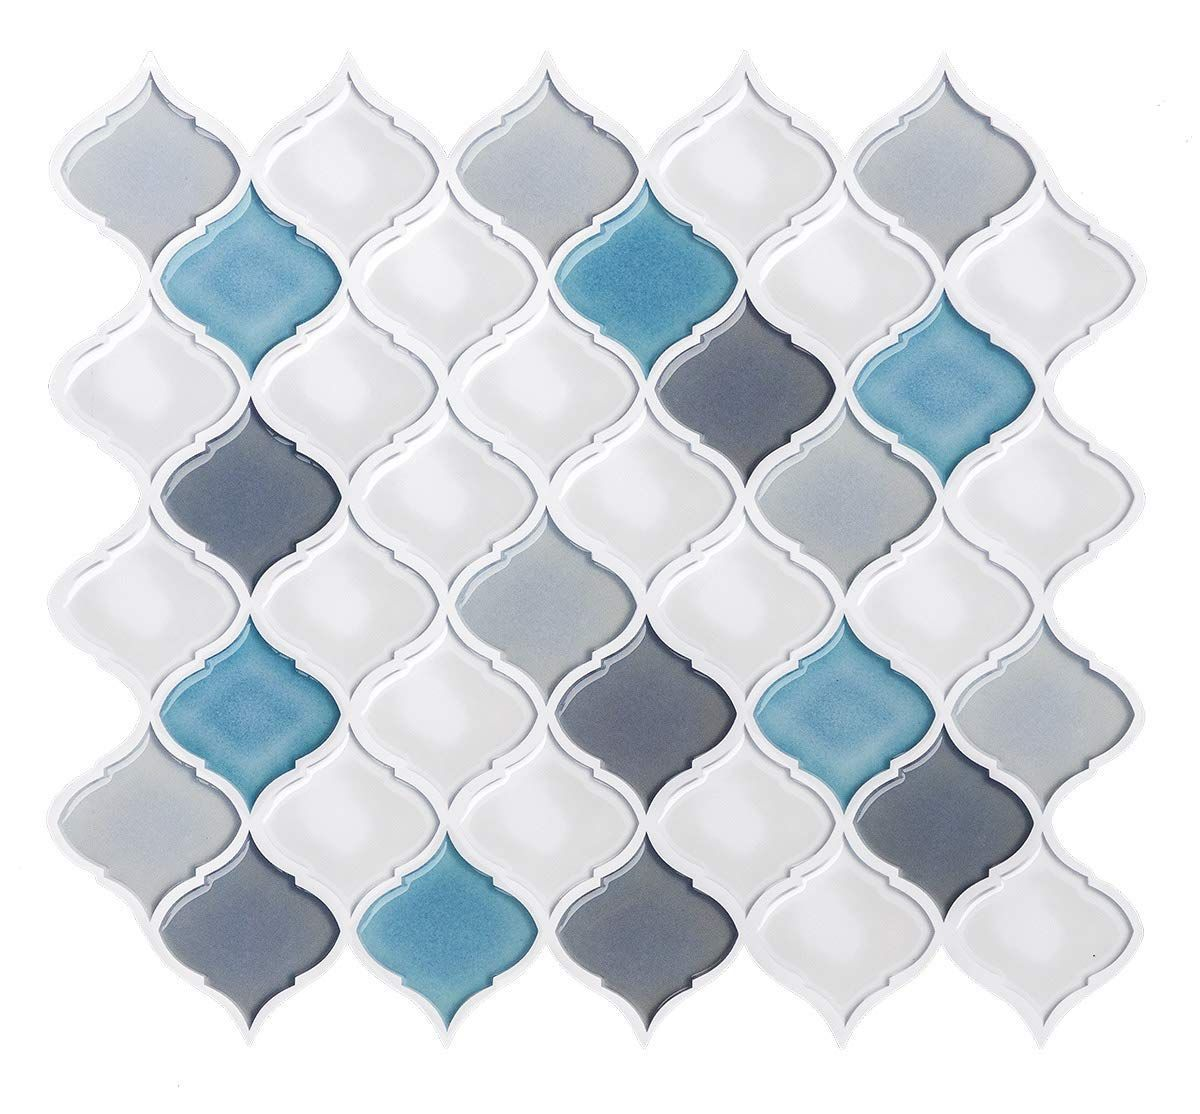 Amazon Com Peel And Stick Tile Backsplash For Kitchen Bathroom Mist White Arabesque Tile Backsp Stick Tile Backsplash Stick On Tiles Arabesque Tile Backsplash